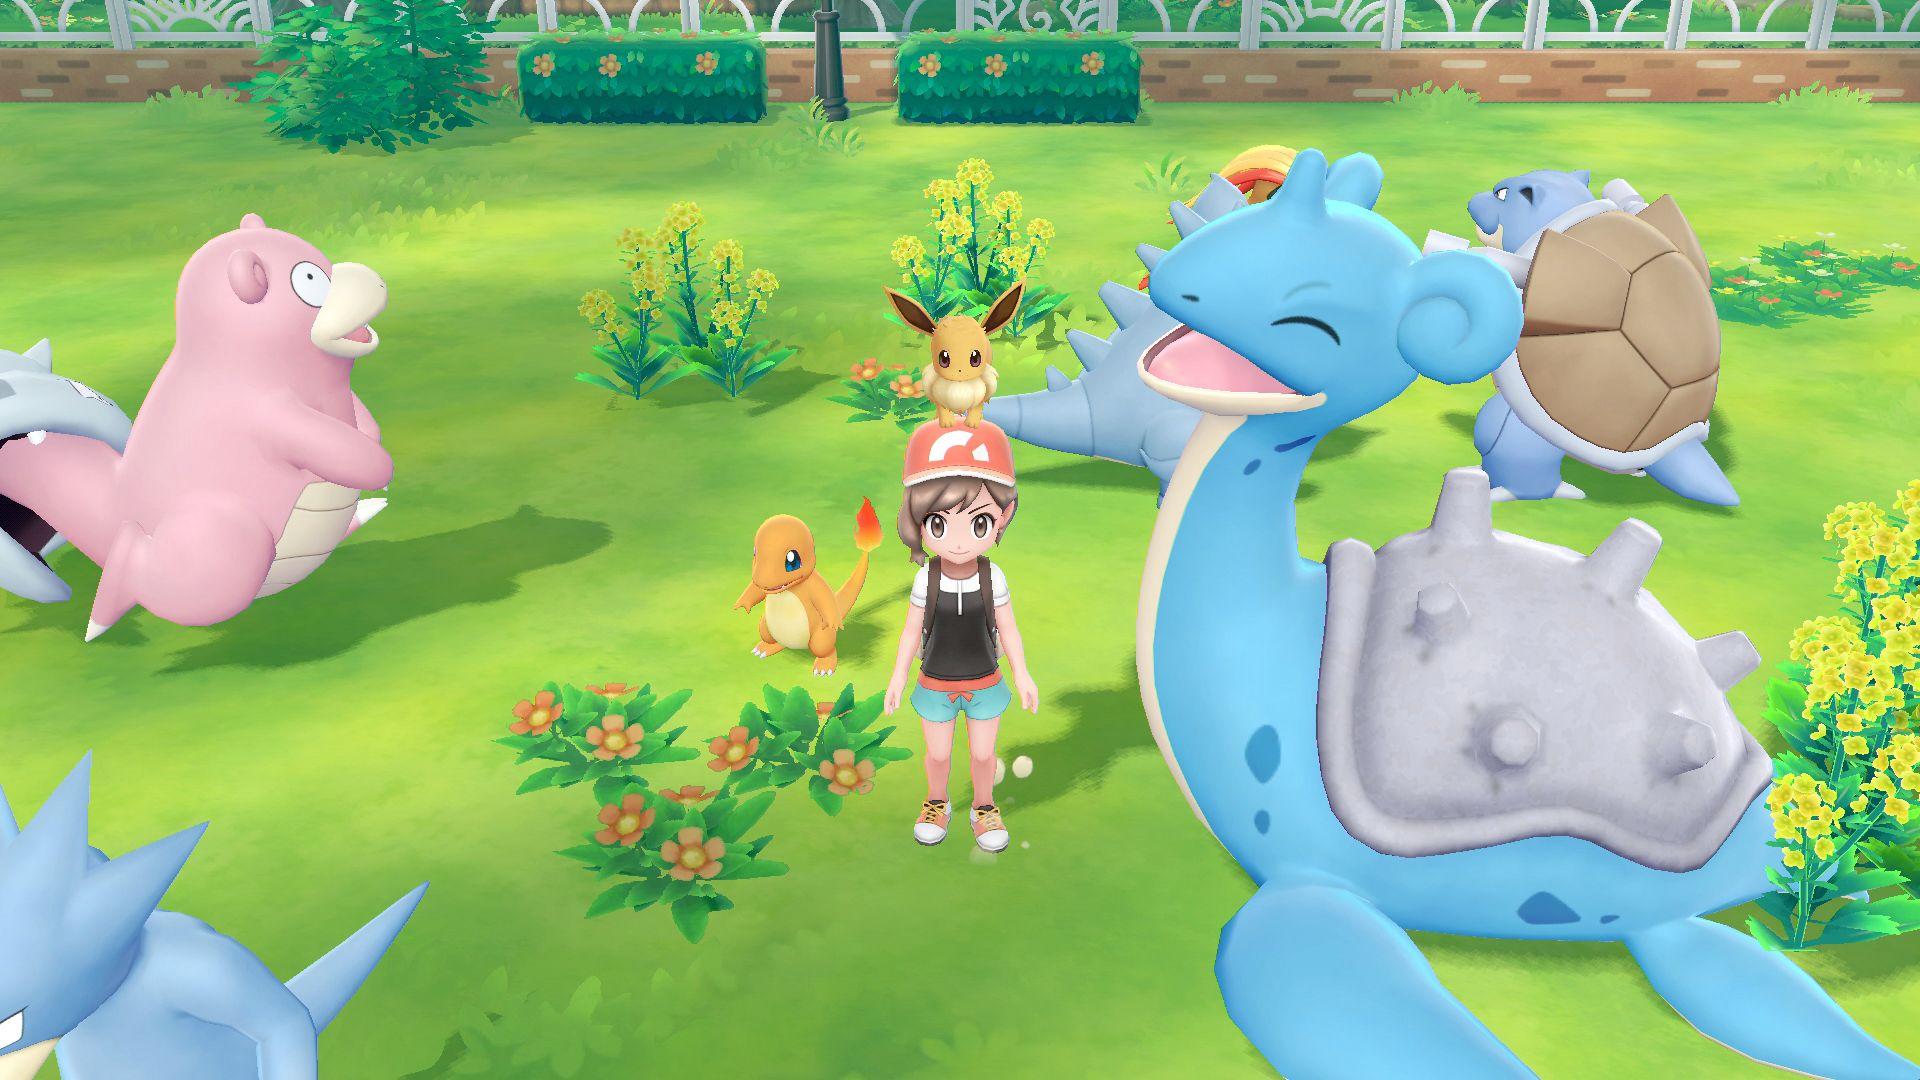 Pokemon: Let's Go Pikachu and Eevee - Legendary Pokemon